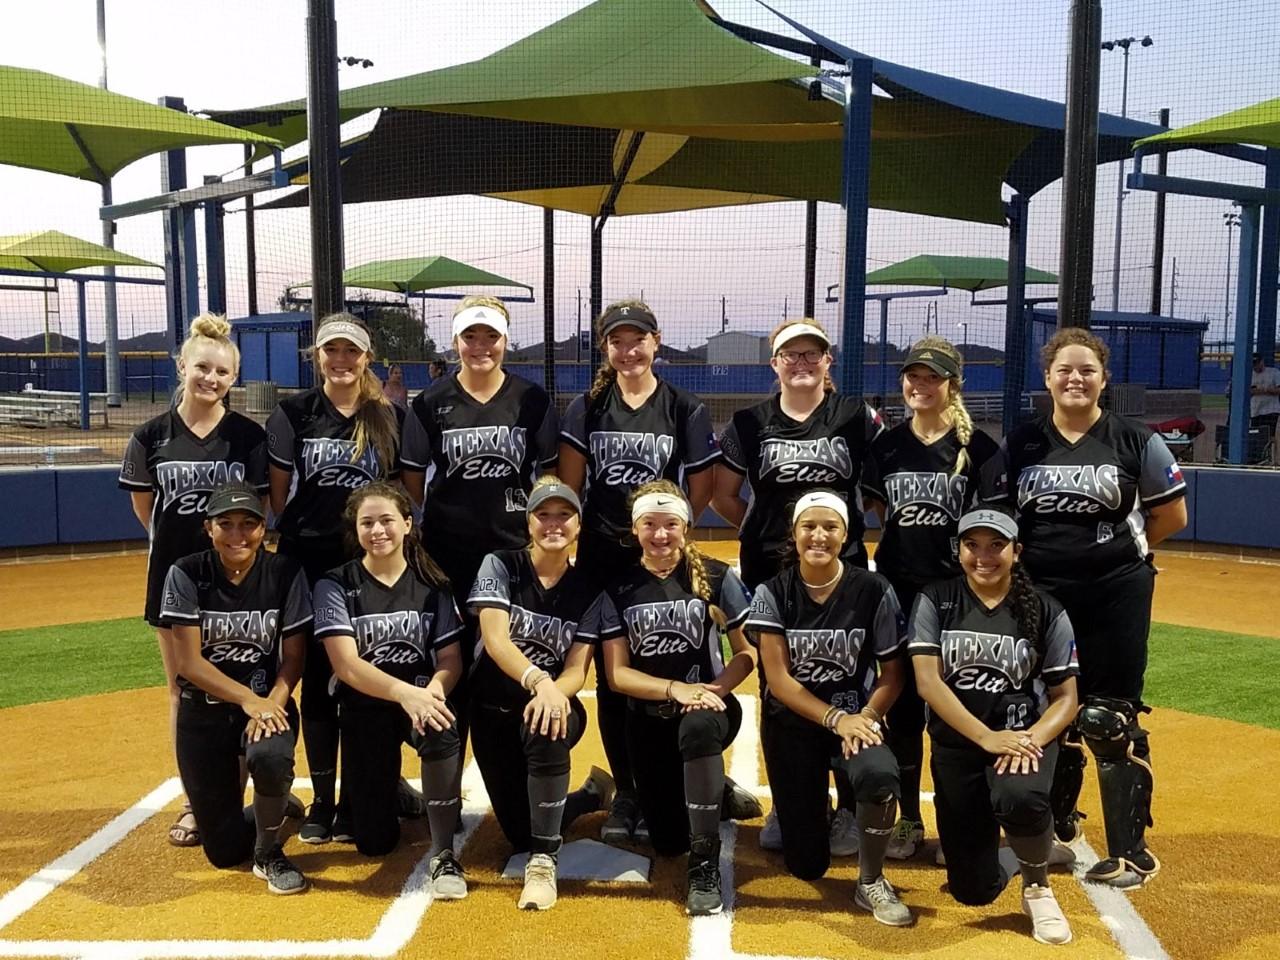 Texas Elite, Texas Elite Softball, Texas Elite Fastpitch